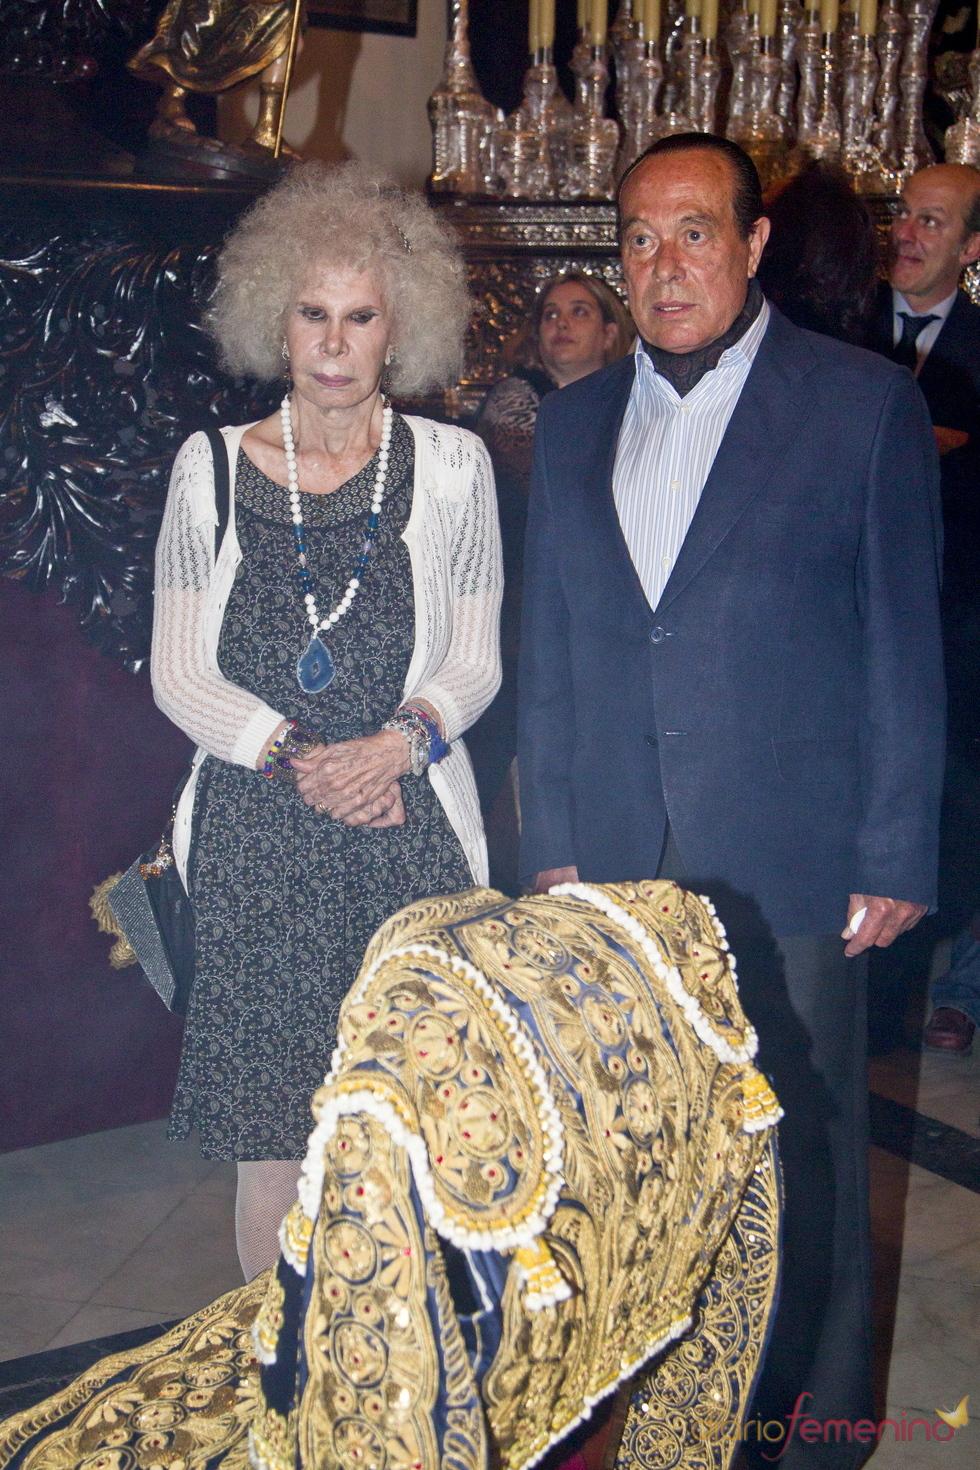 La Duquesa de Alba prepara la Semana Santa junto a Curro Romero